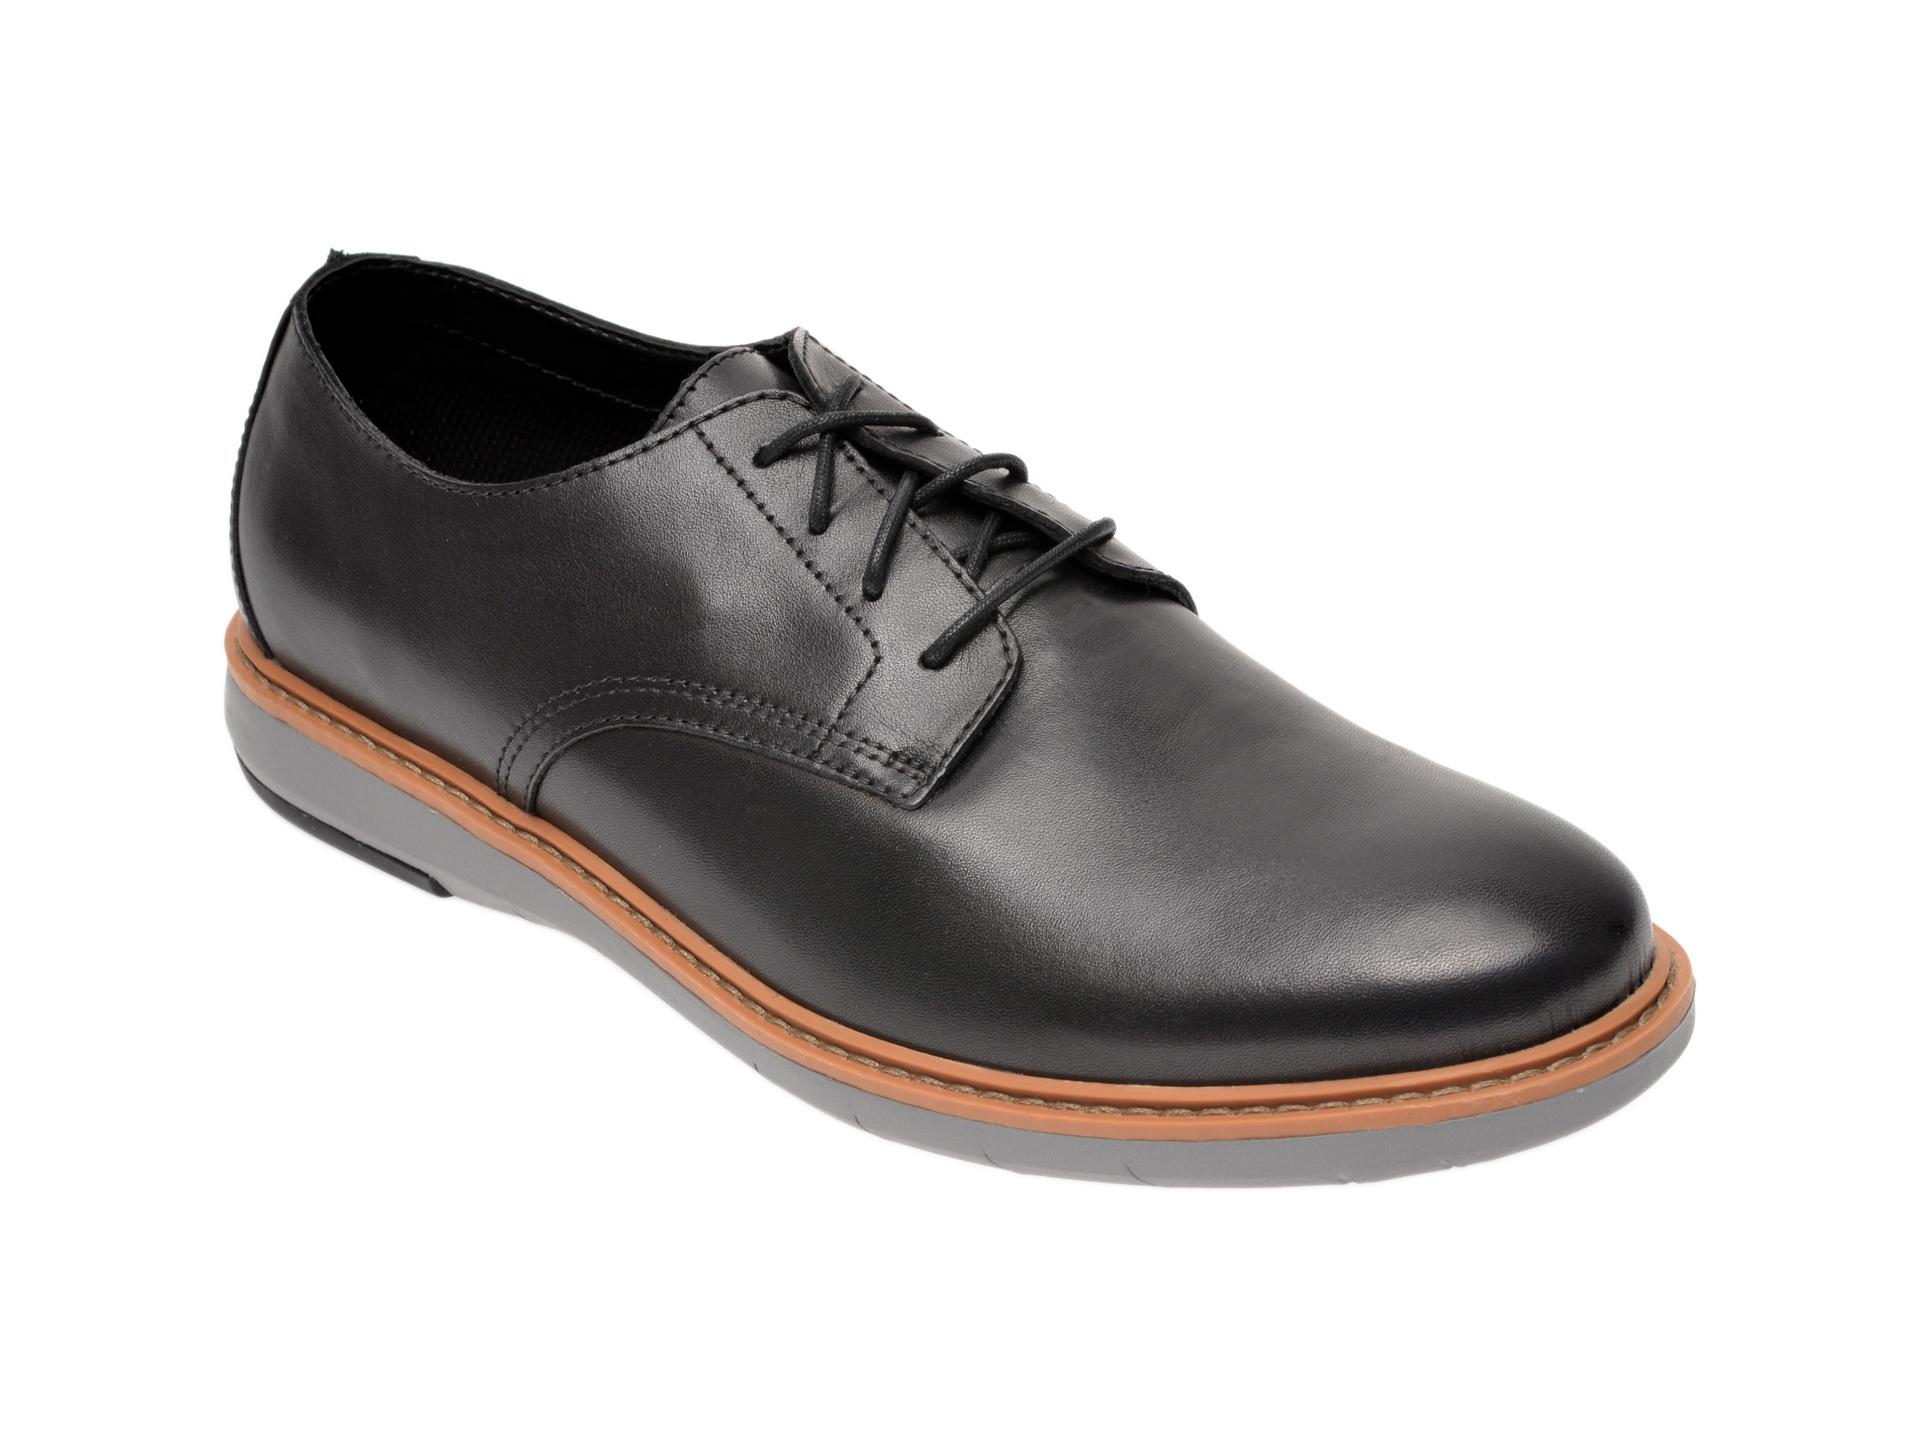 Pantofi CLARKS negri, Draper Lace, din piele naturala imagine